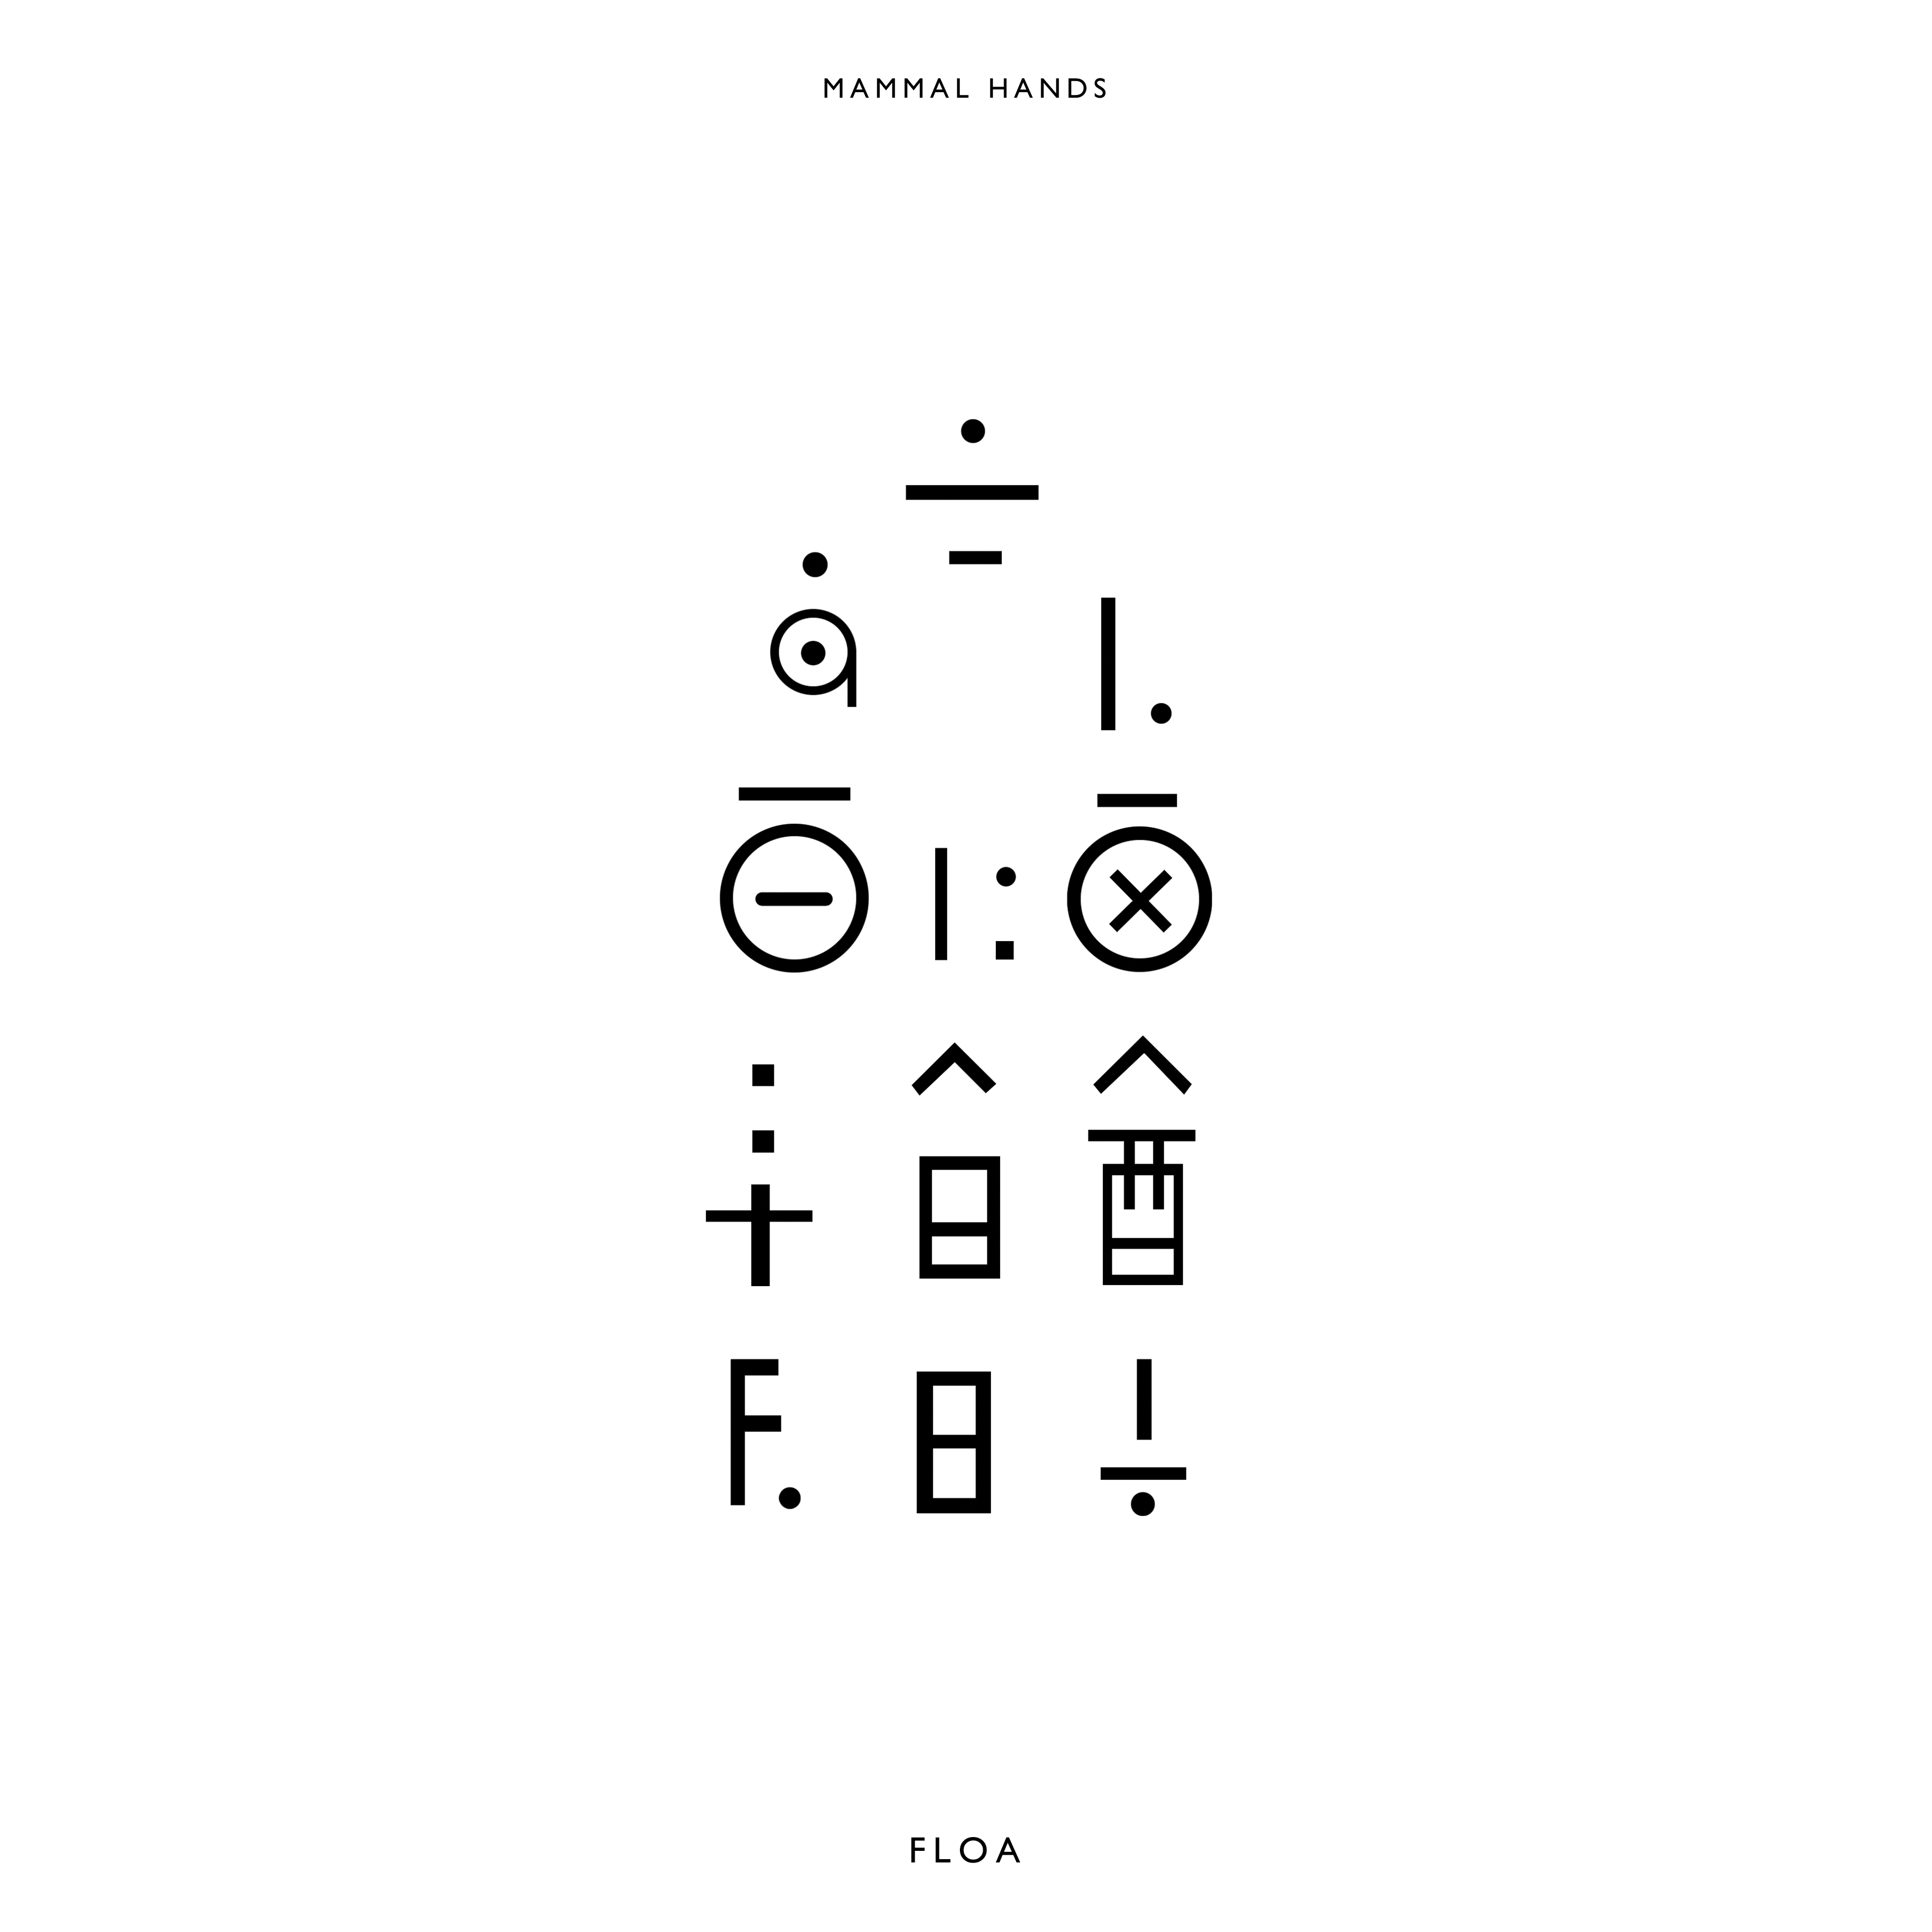 Order Mammal Hands new album Floa on LP/CD/DL